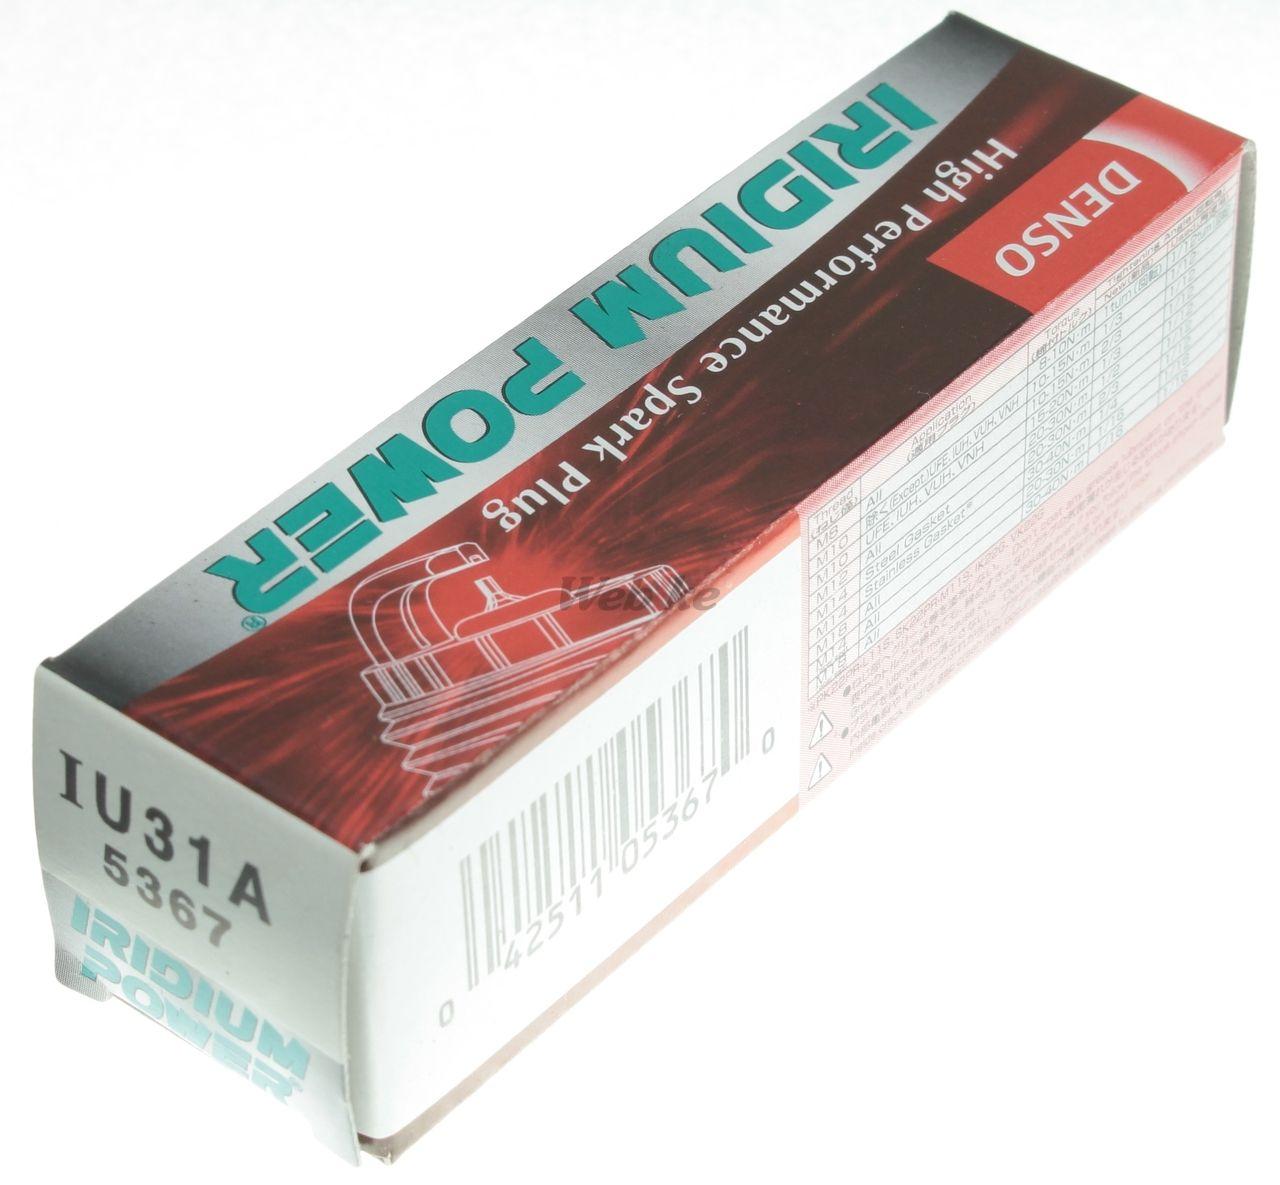 【DENSO】銥合金 火星塞 IU31A - 「Webike-摩托百貨」